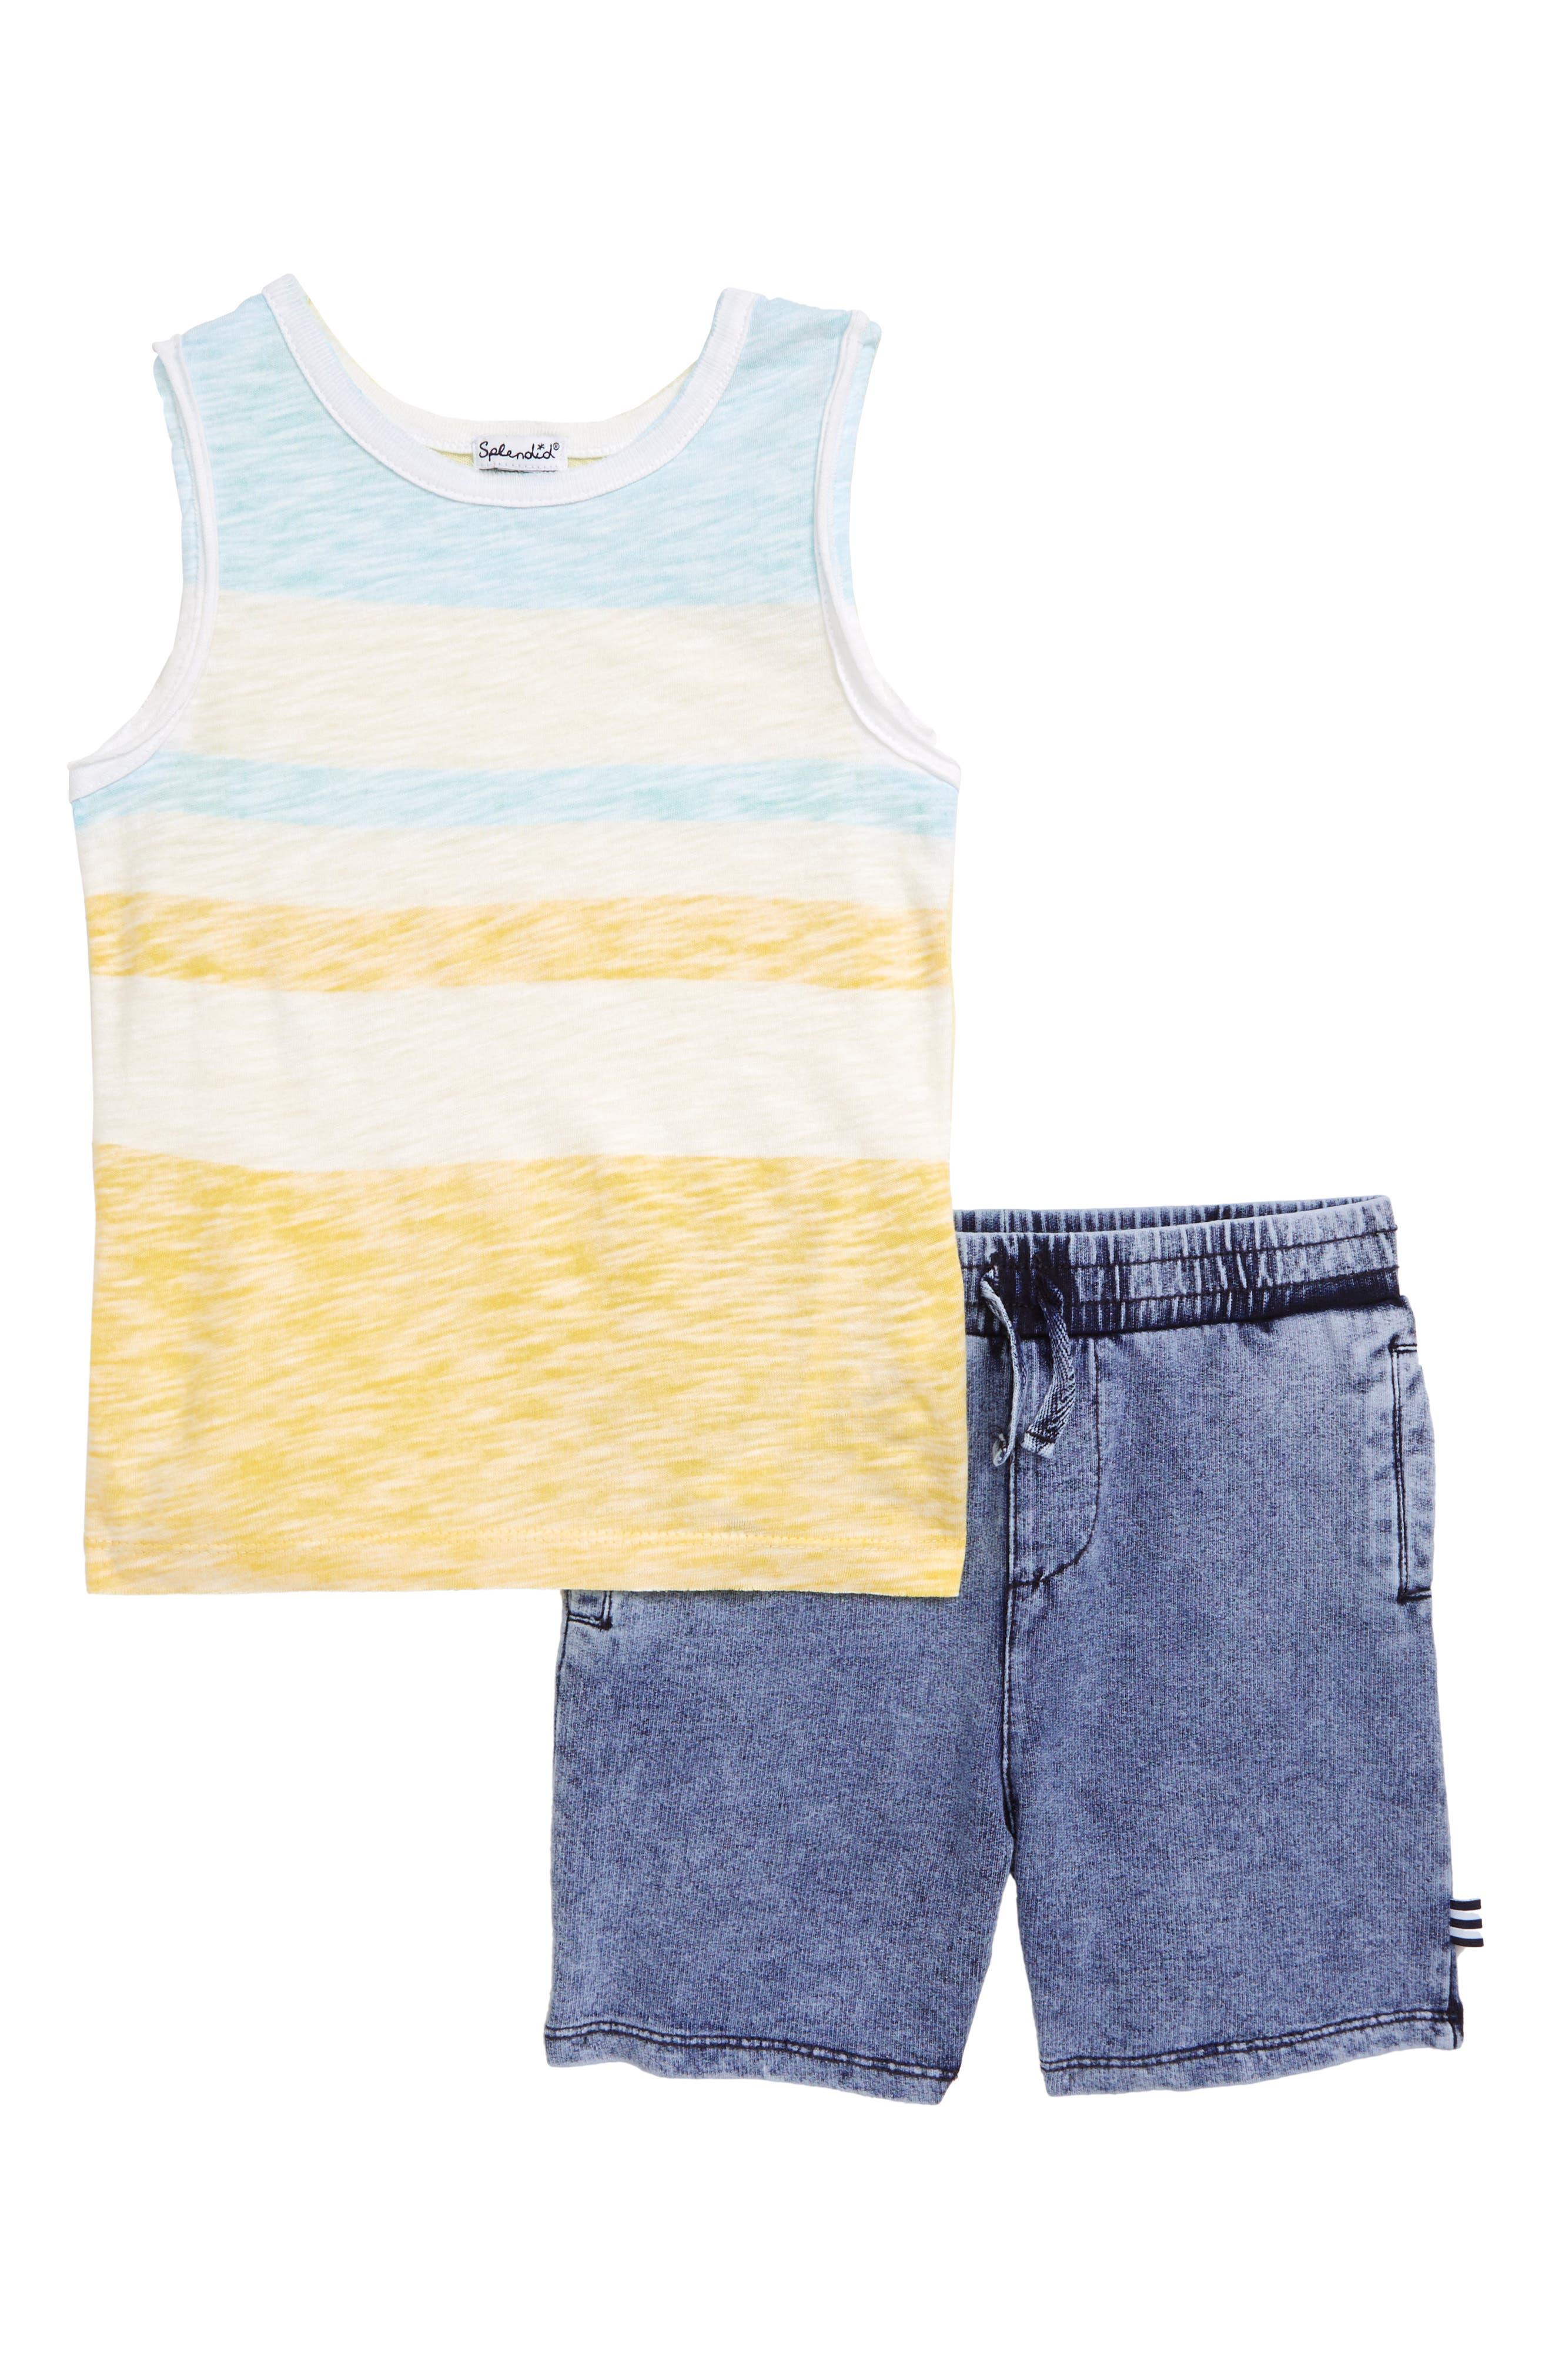 Boys Splendid Muscle Shirt  Shorts Set